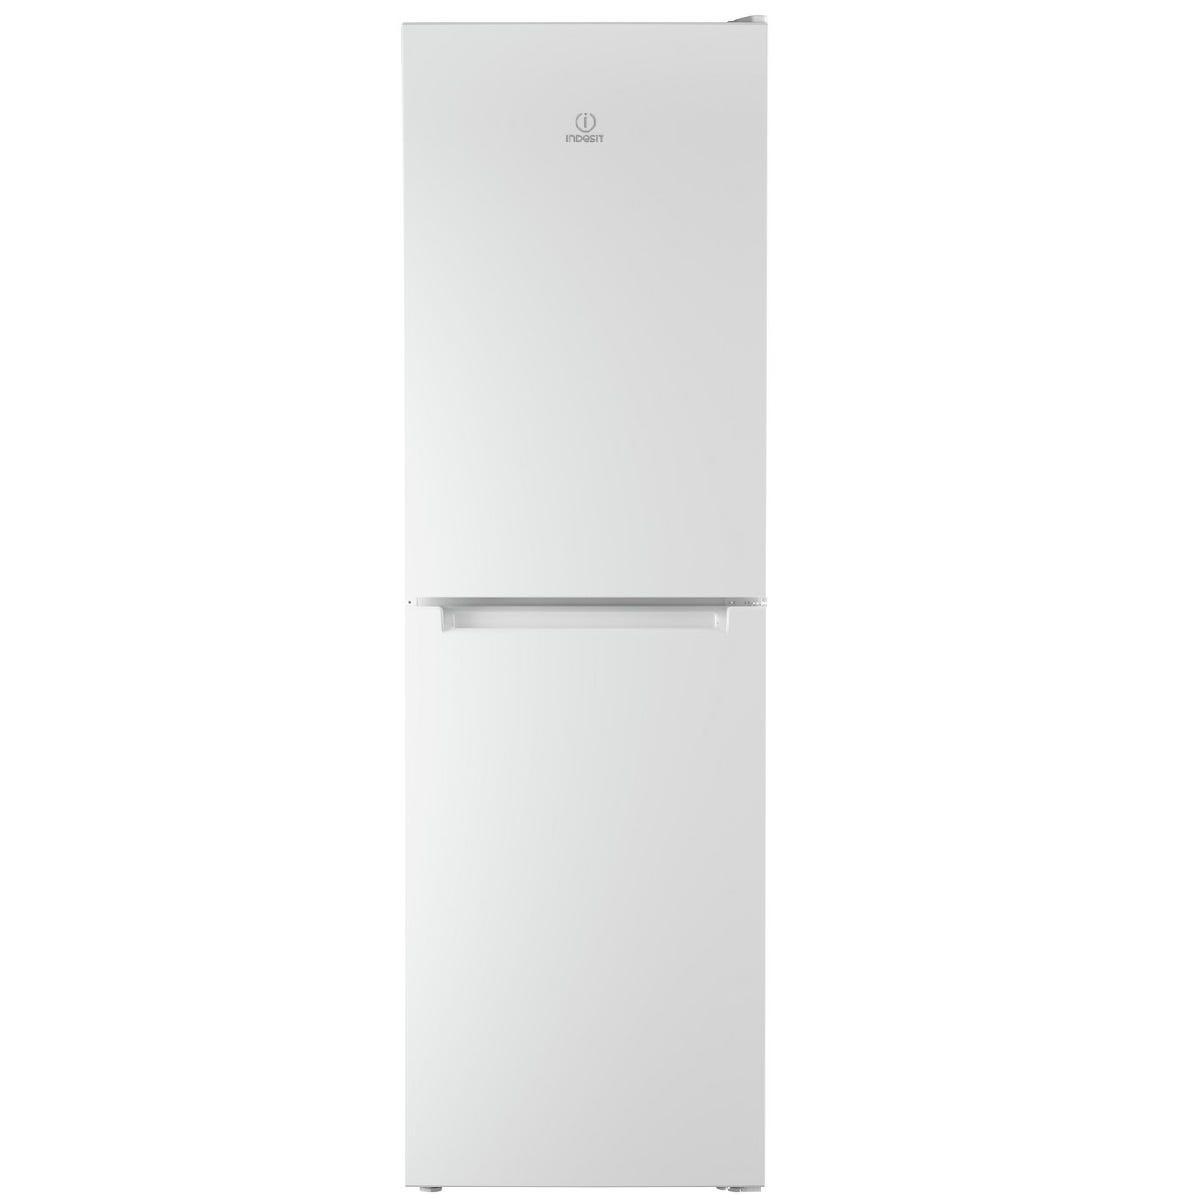 indesit ld85 f1w fridge freezer - white